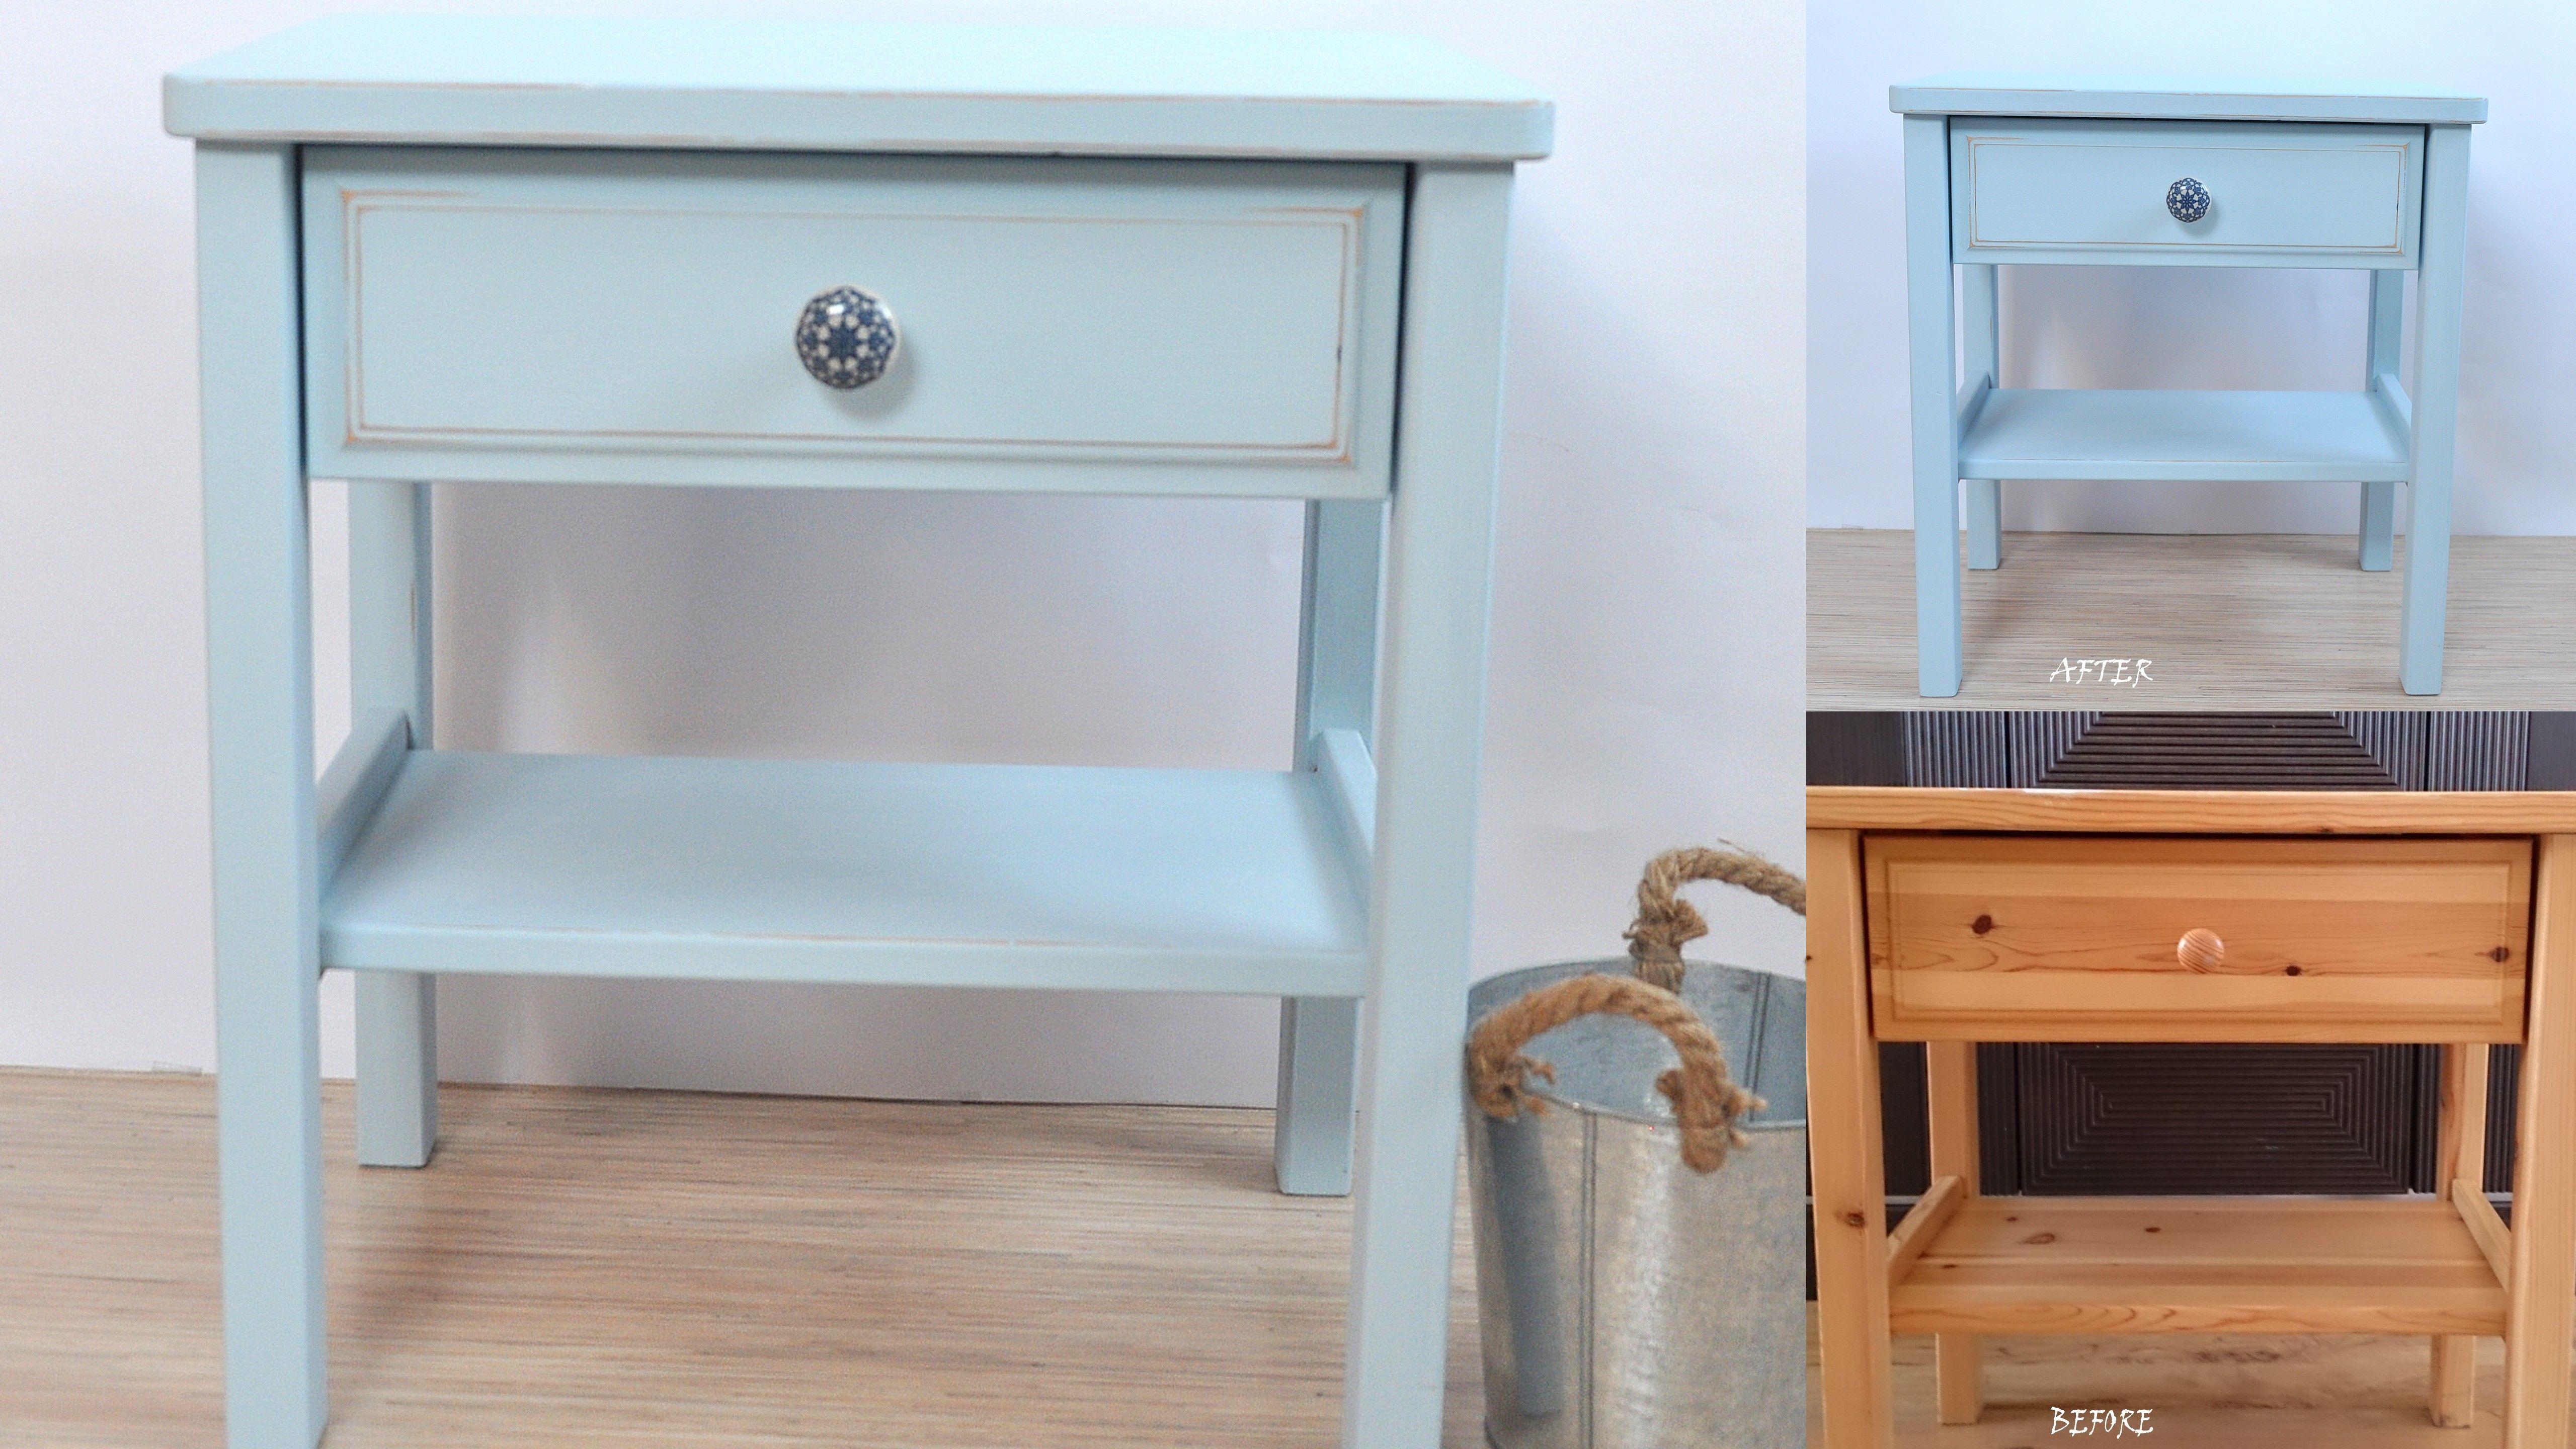 stoliczki nocne kolor polar blue before after autentico chalk paint pinterest. Black Bedroom Furniture Sets. Home Design Ideas